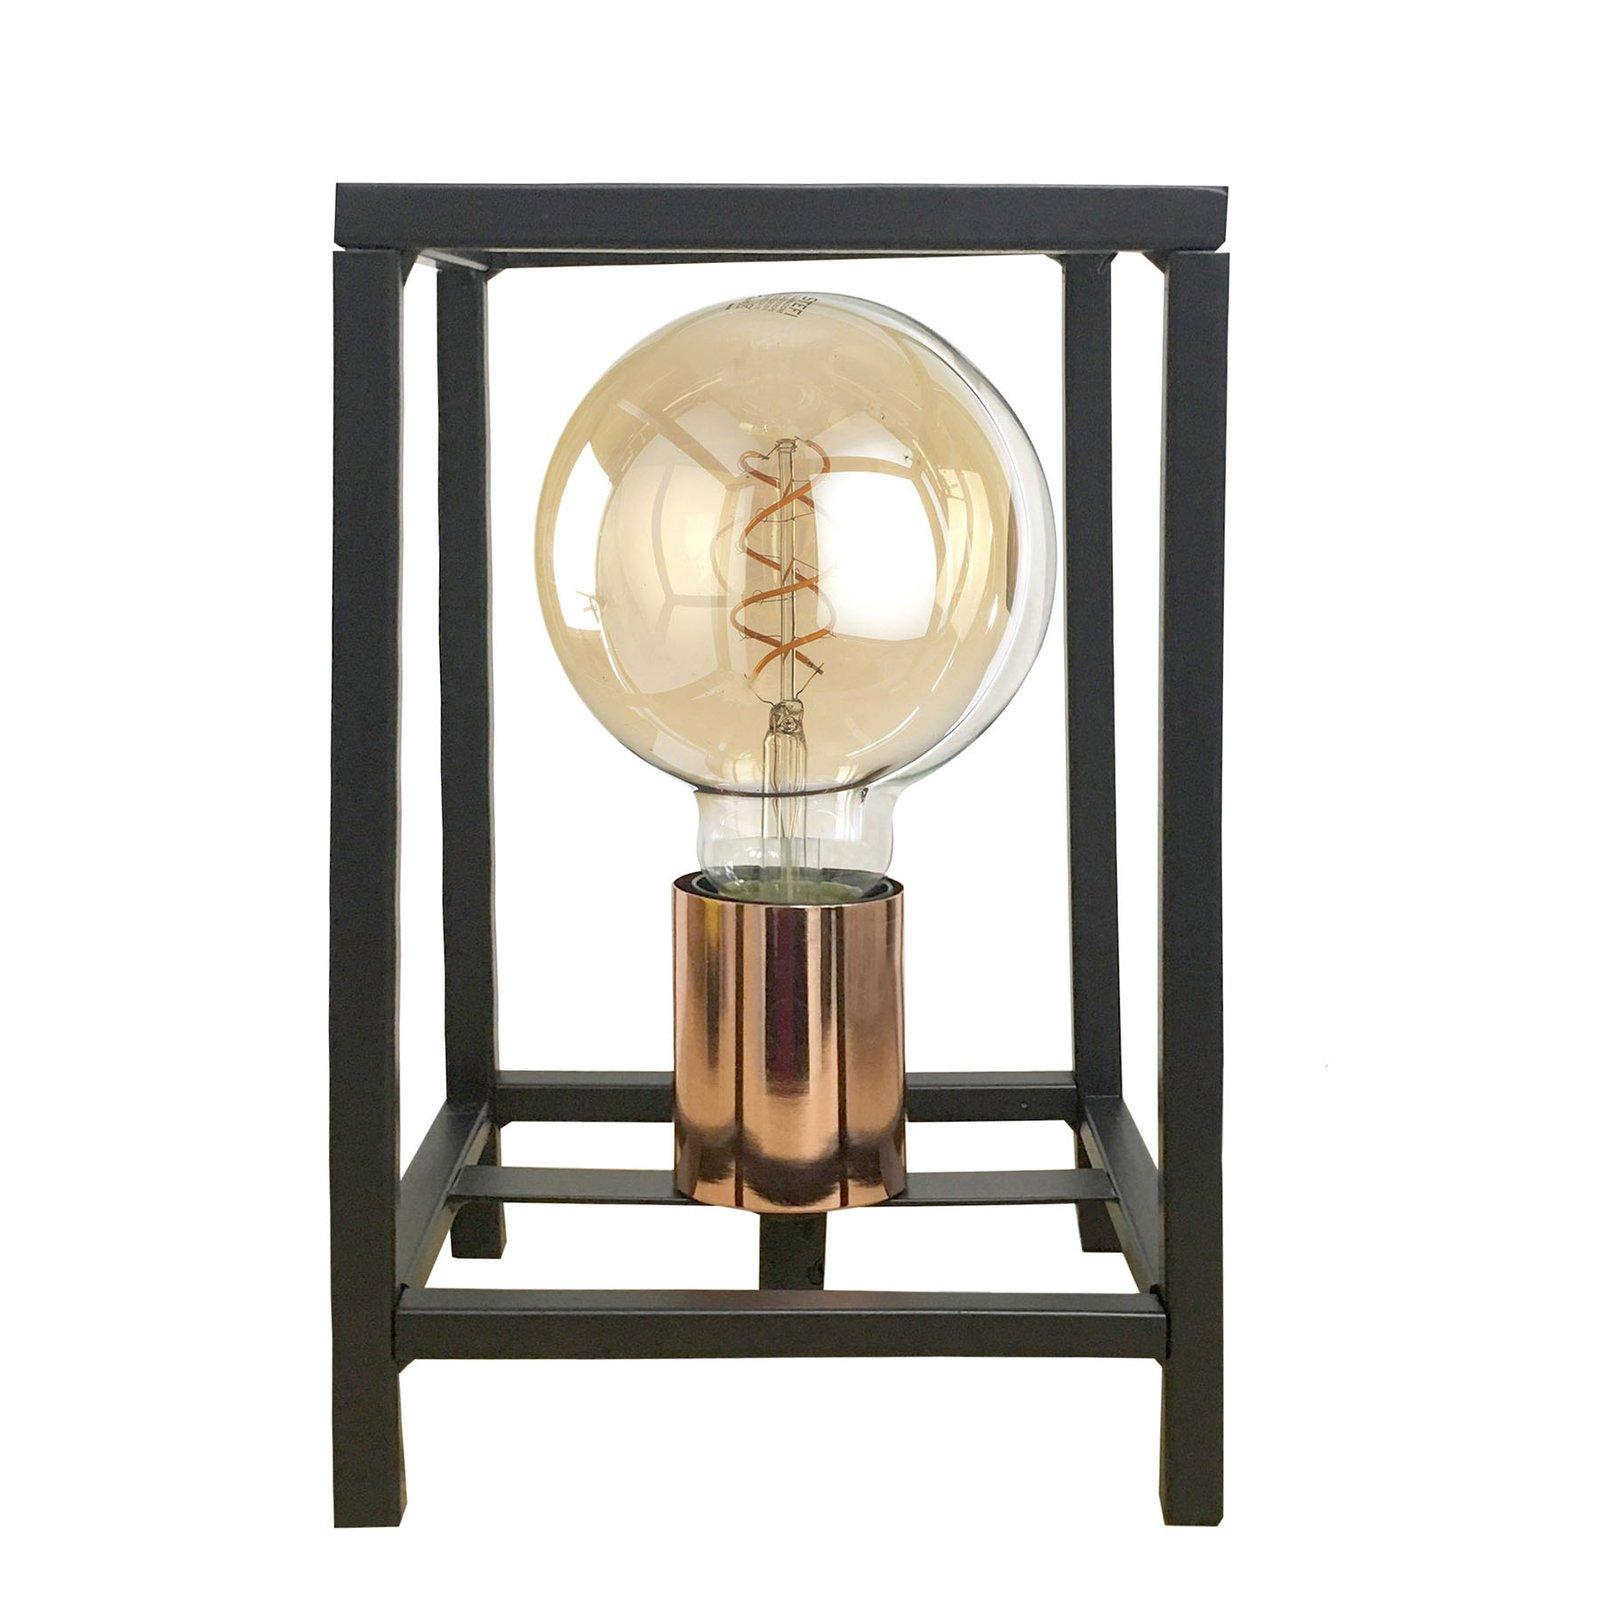 Bordlampe Floki som åpen kvadrat